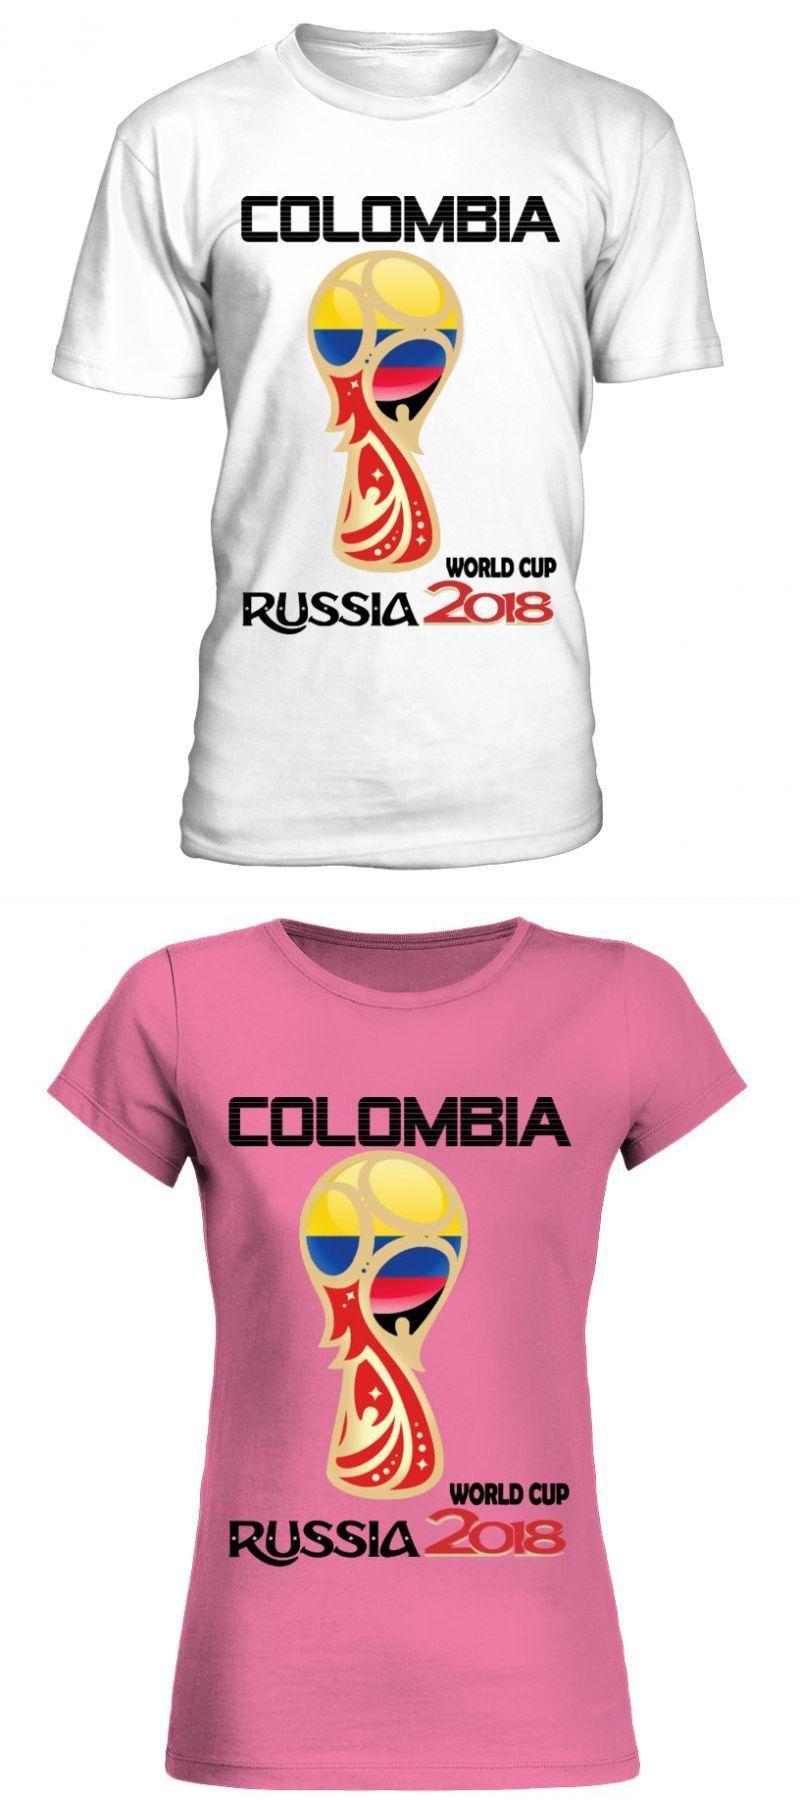 9f43f33b925 Xavier basketball t shirt colombia t-shirt russia 2018 world jersey t shirt  basketball design  xavier  basketball  shirt  colombia  t-shirt  russia   2018 ...